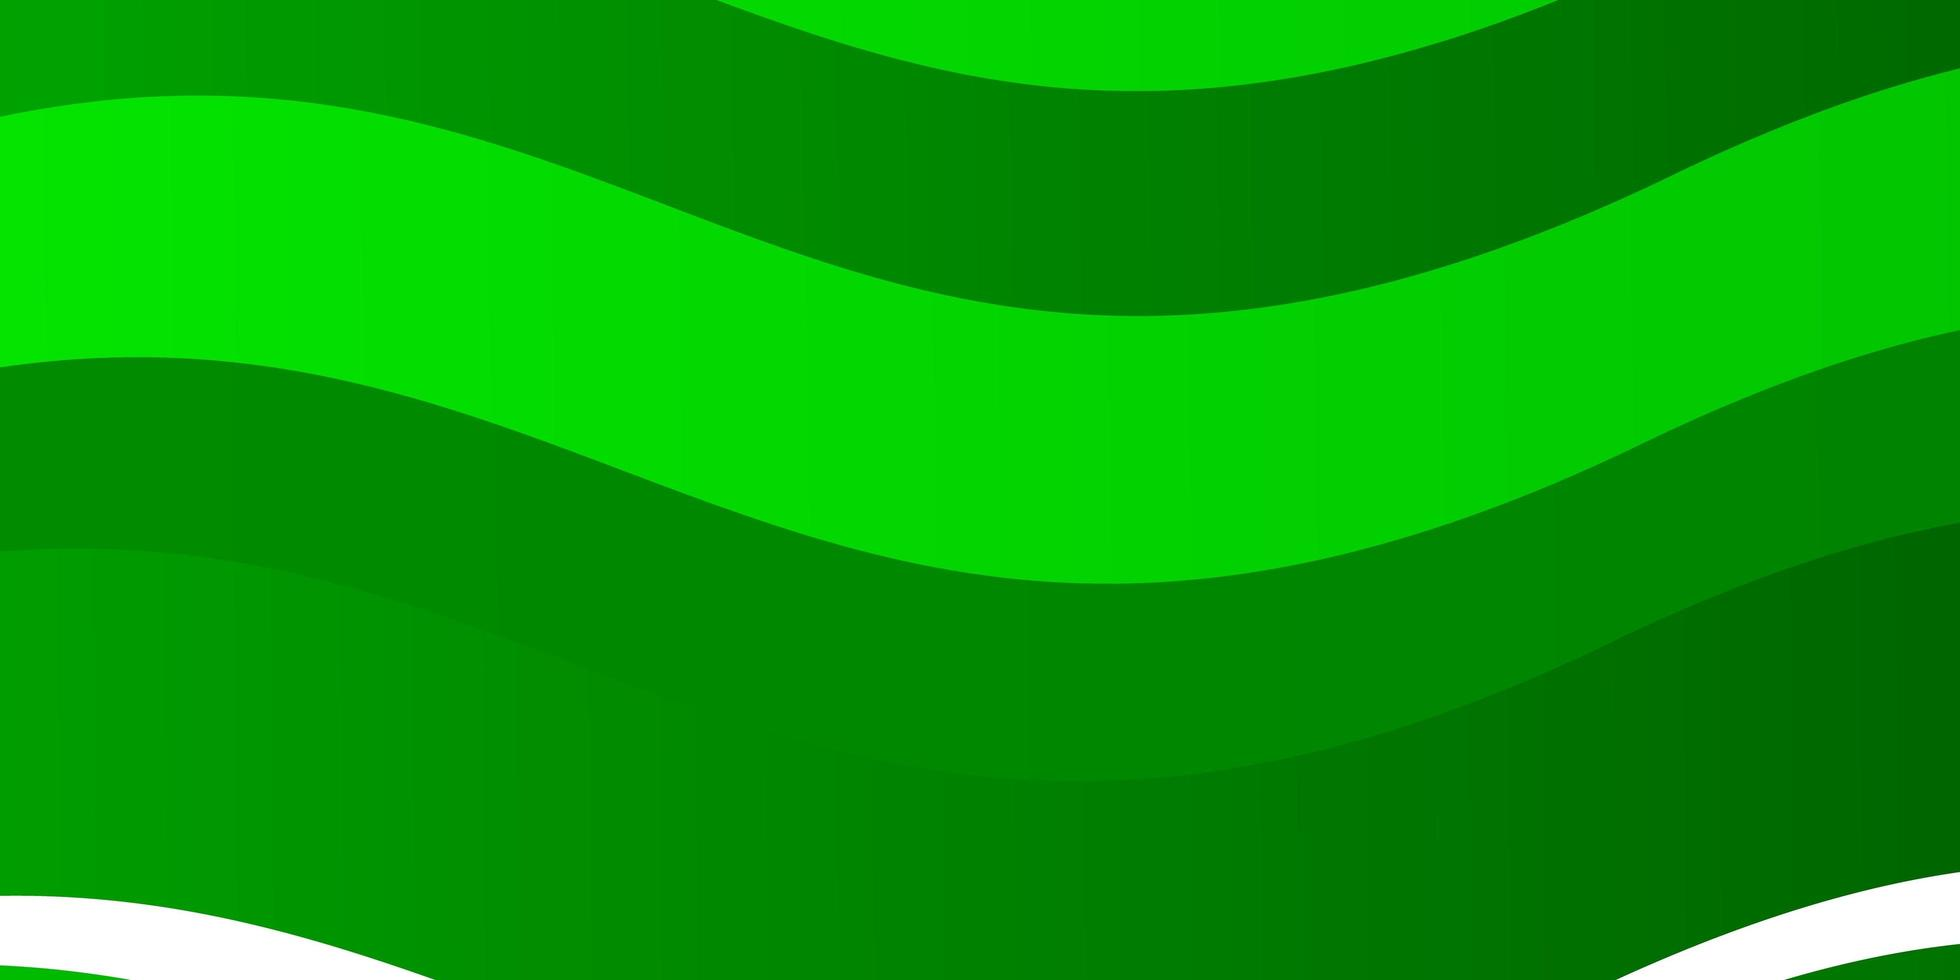 fondo verde claro con líneas torcidas. vector